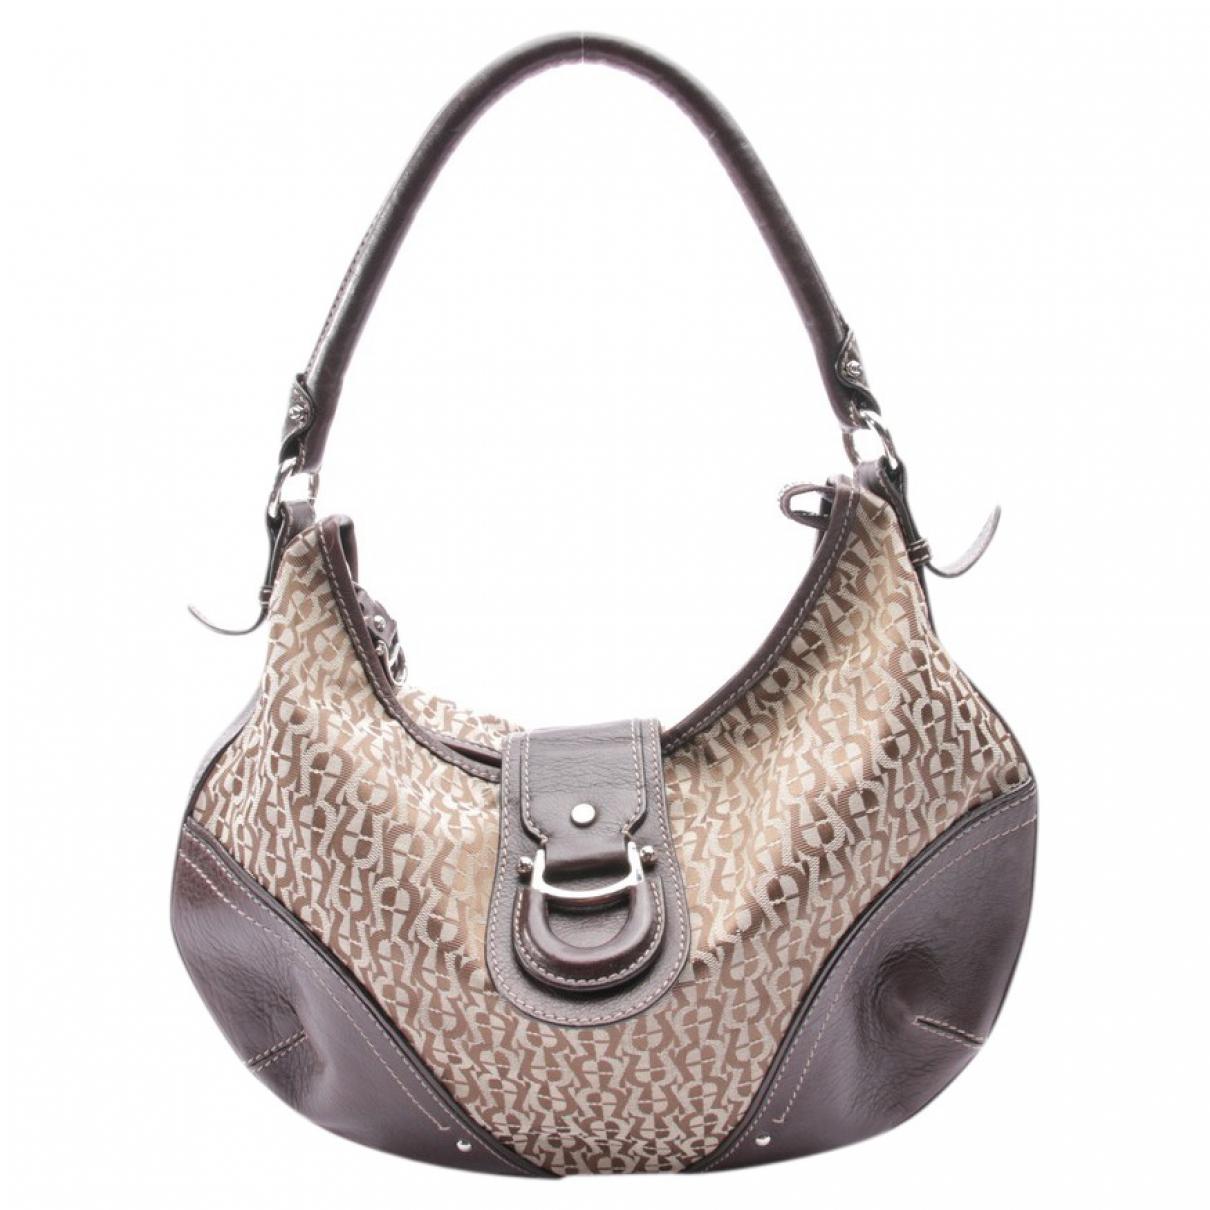 Aigner \N Brown Leather handbag for Women \N